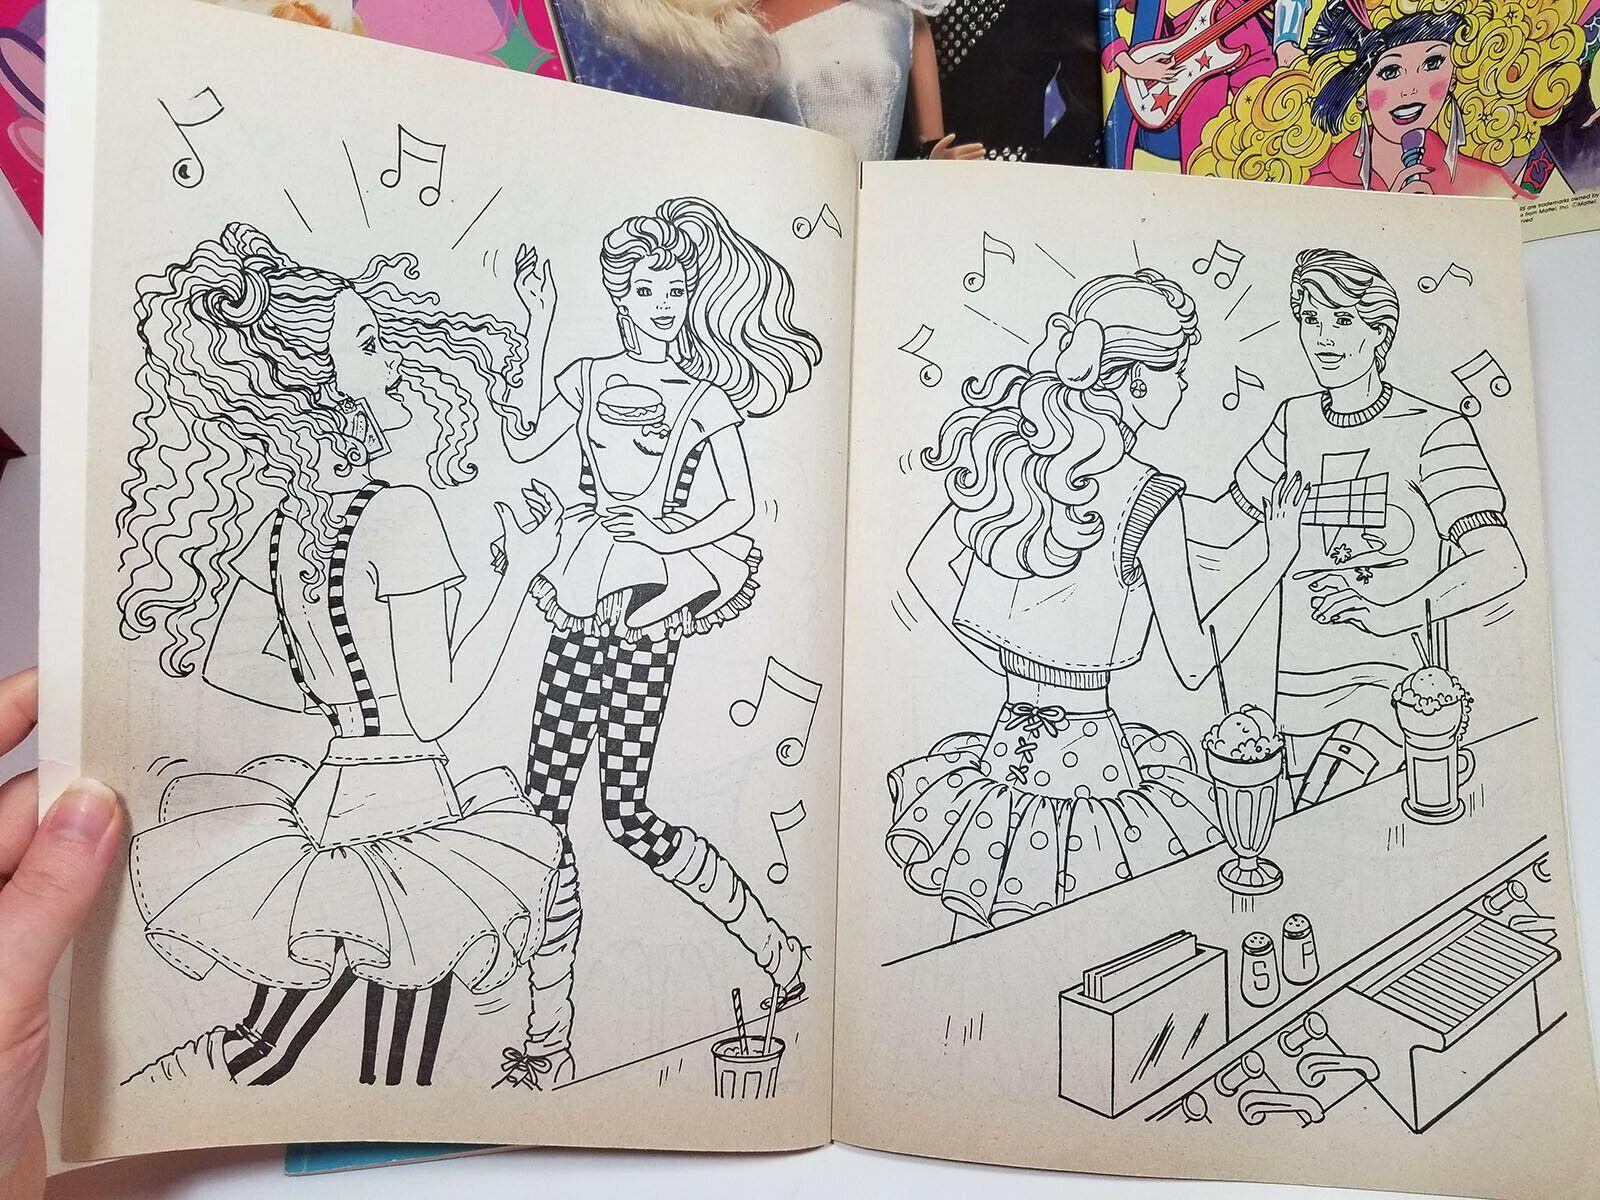 Barbie Coloring Books Lot Of 5 Vintage 80s 90s Cool Times Ballerina Ken Rockers 2 Vintage Coloring Books Barbie Coloring Kids Coloring Books